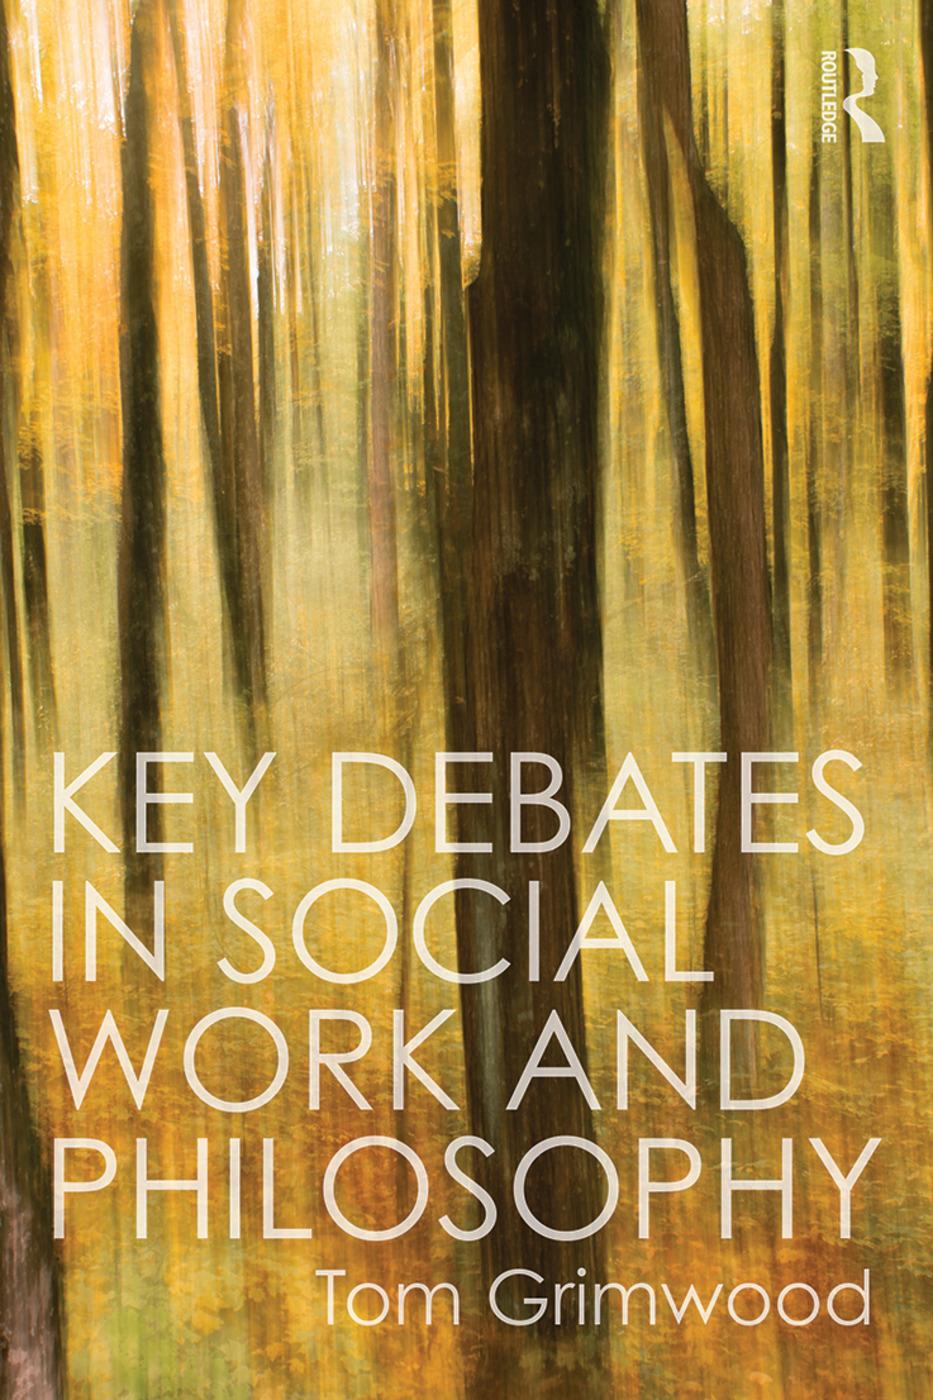 Key Debates in Social Work and Philosophy book cover